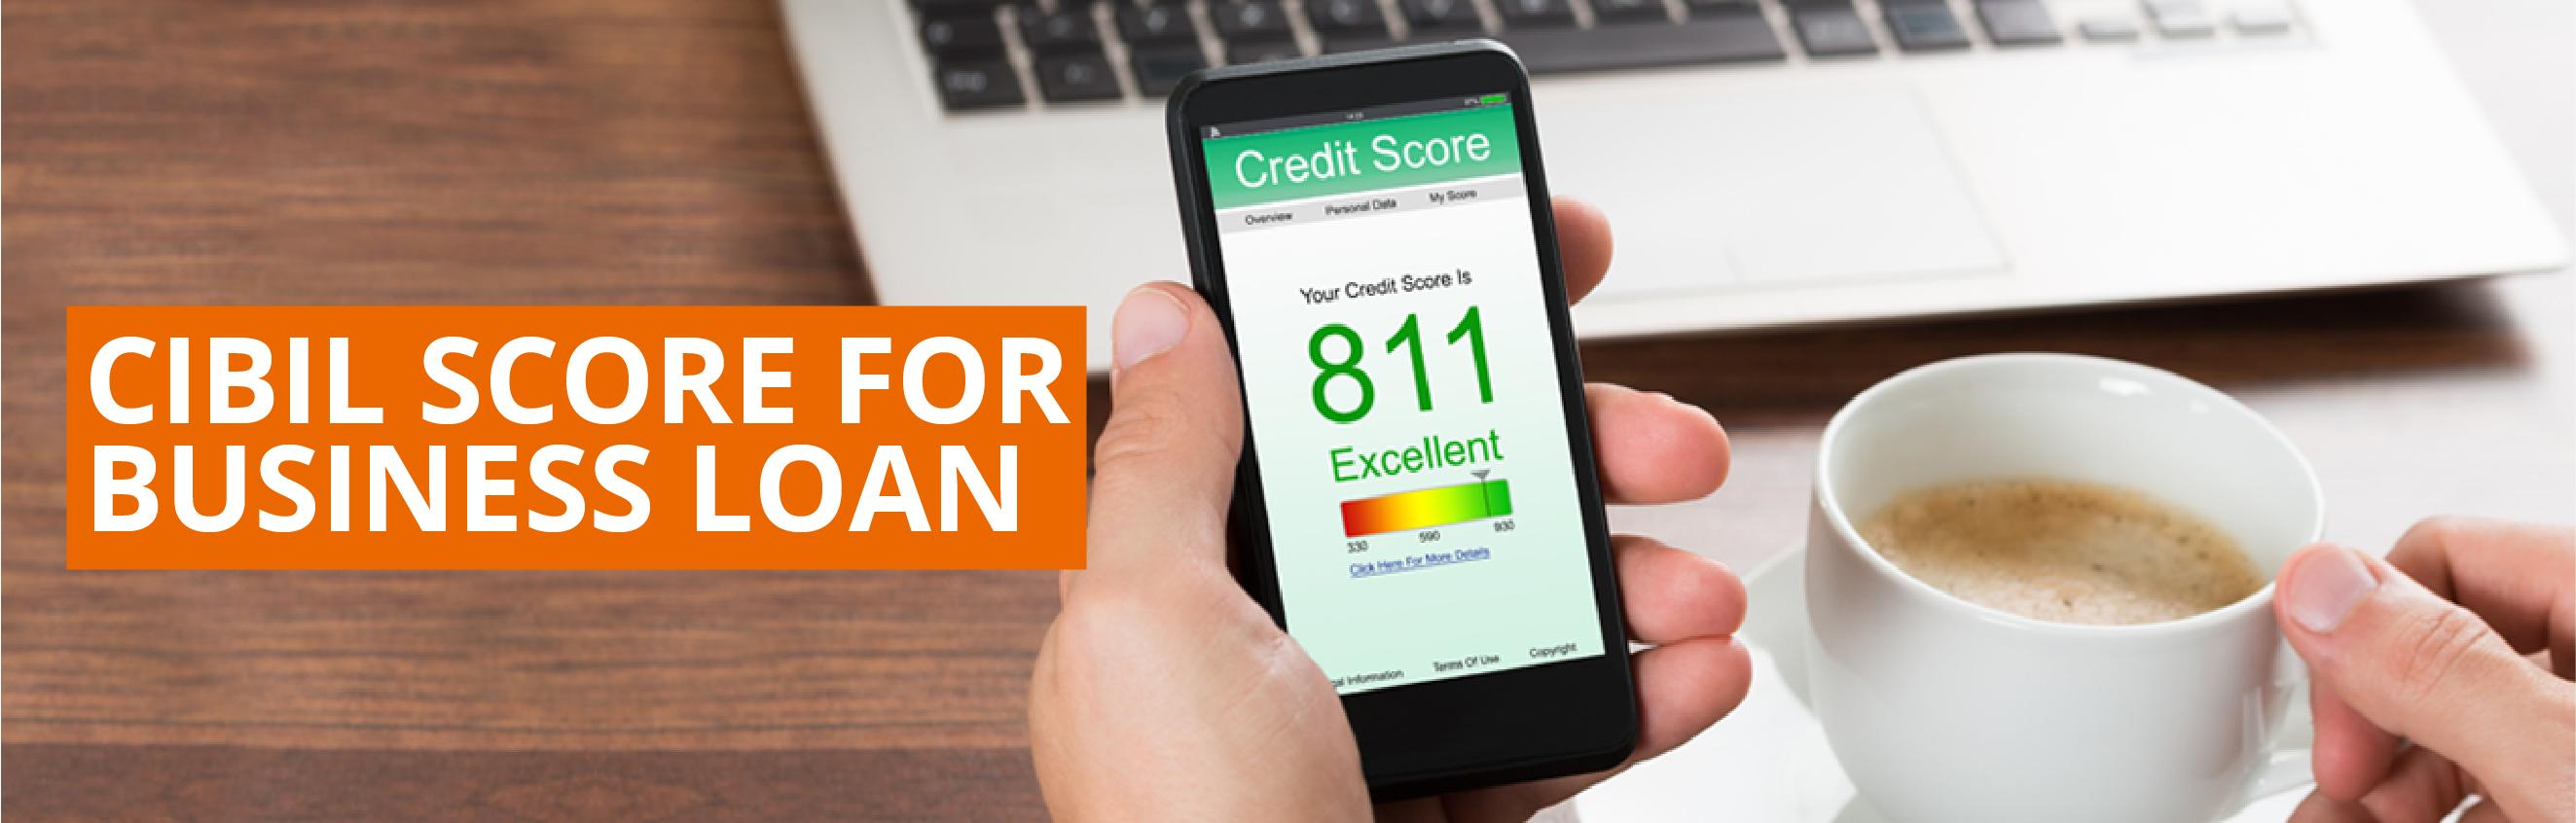 Cibil Score for Business Loan